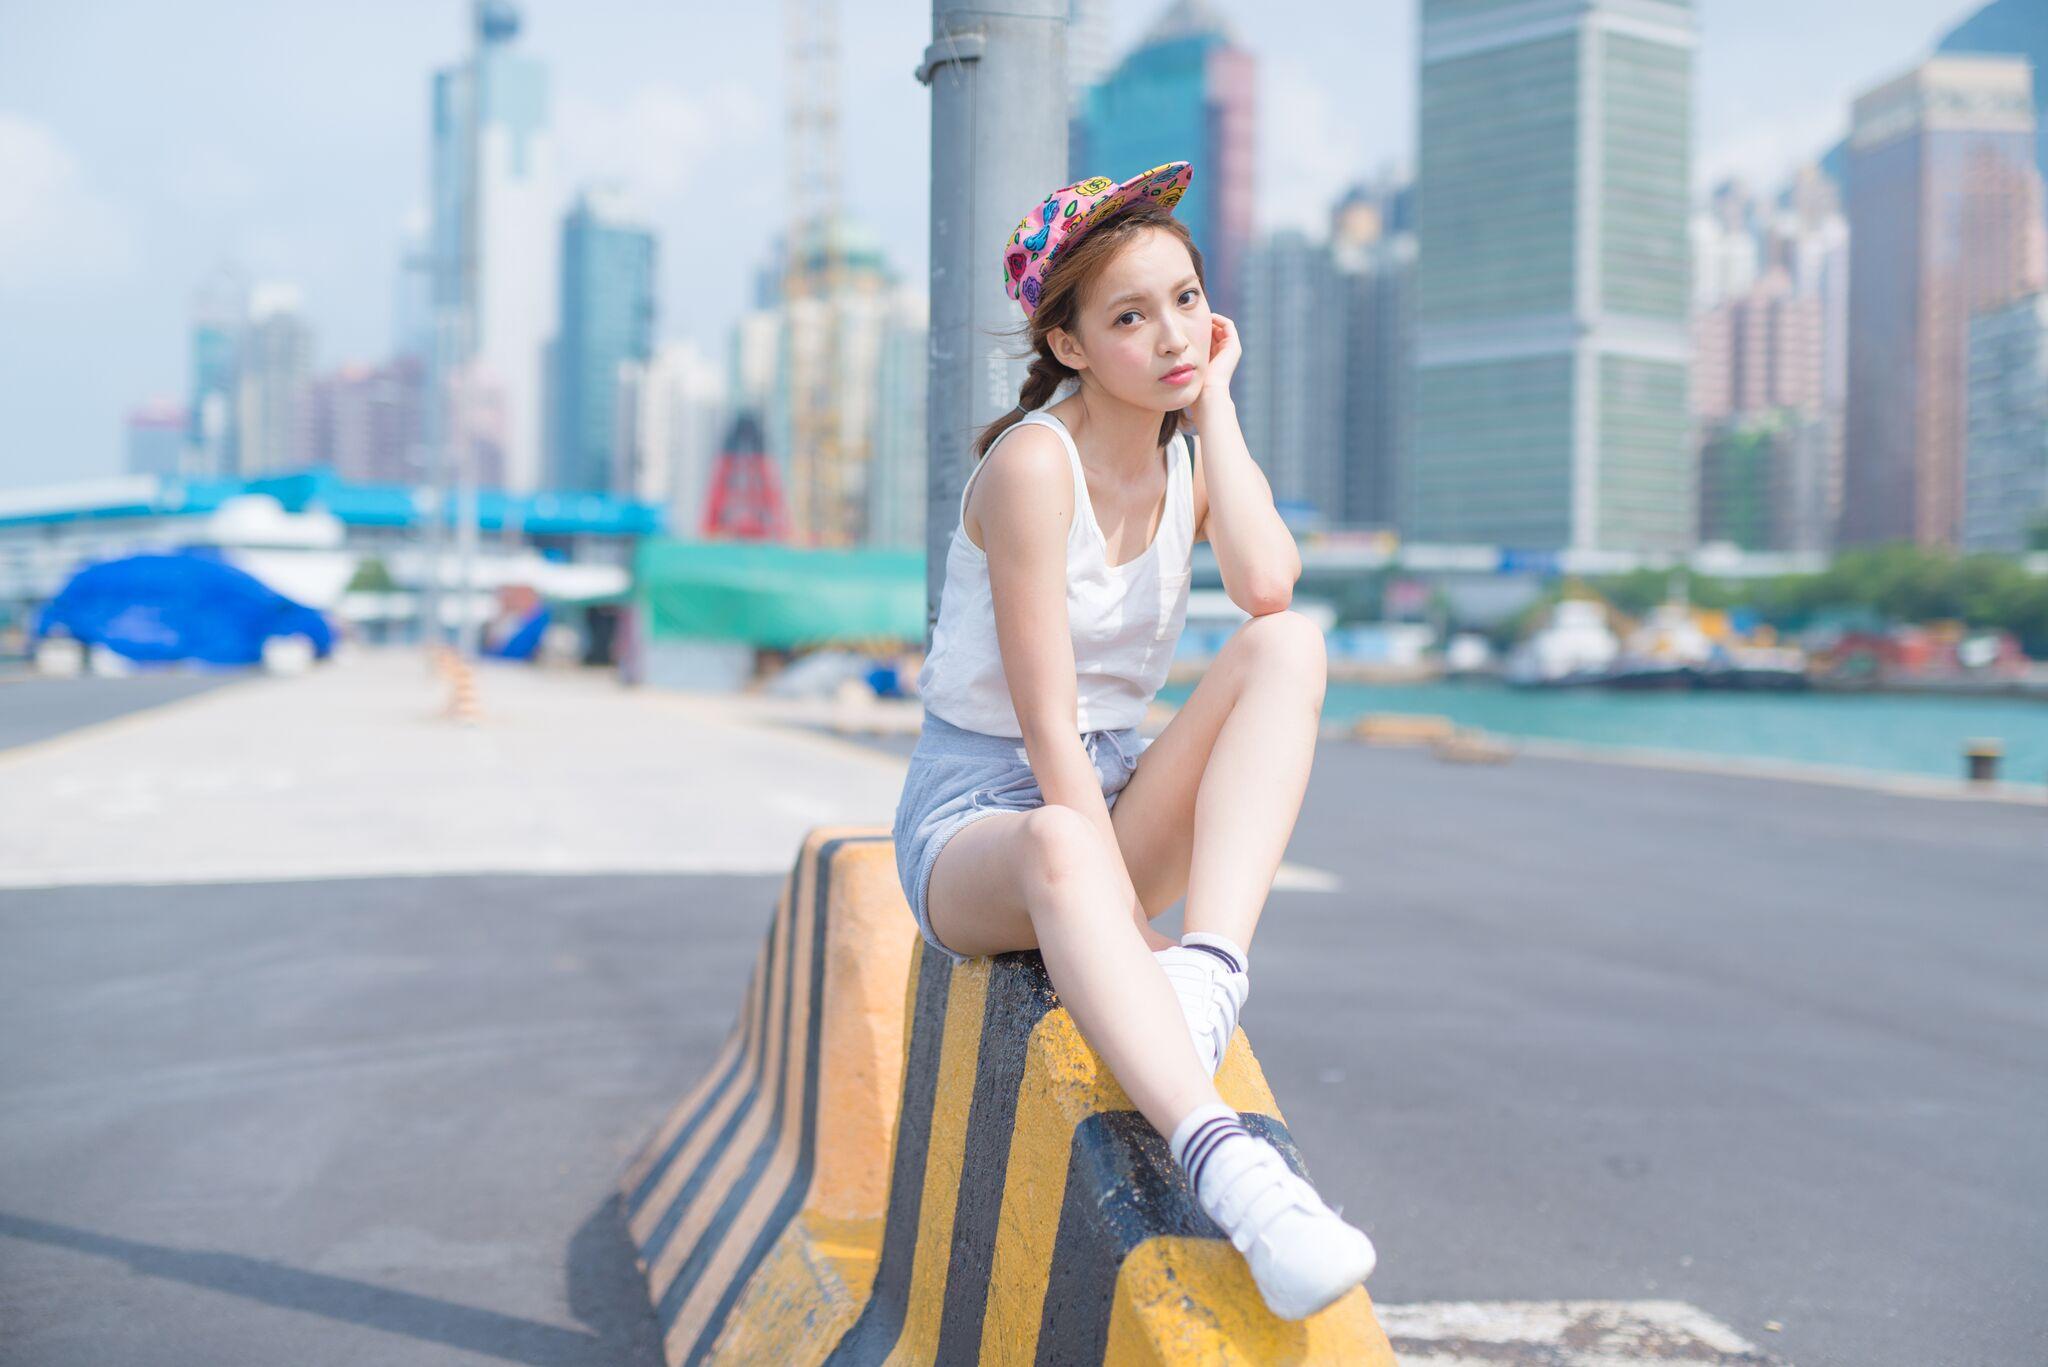 suey kwok 郭思